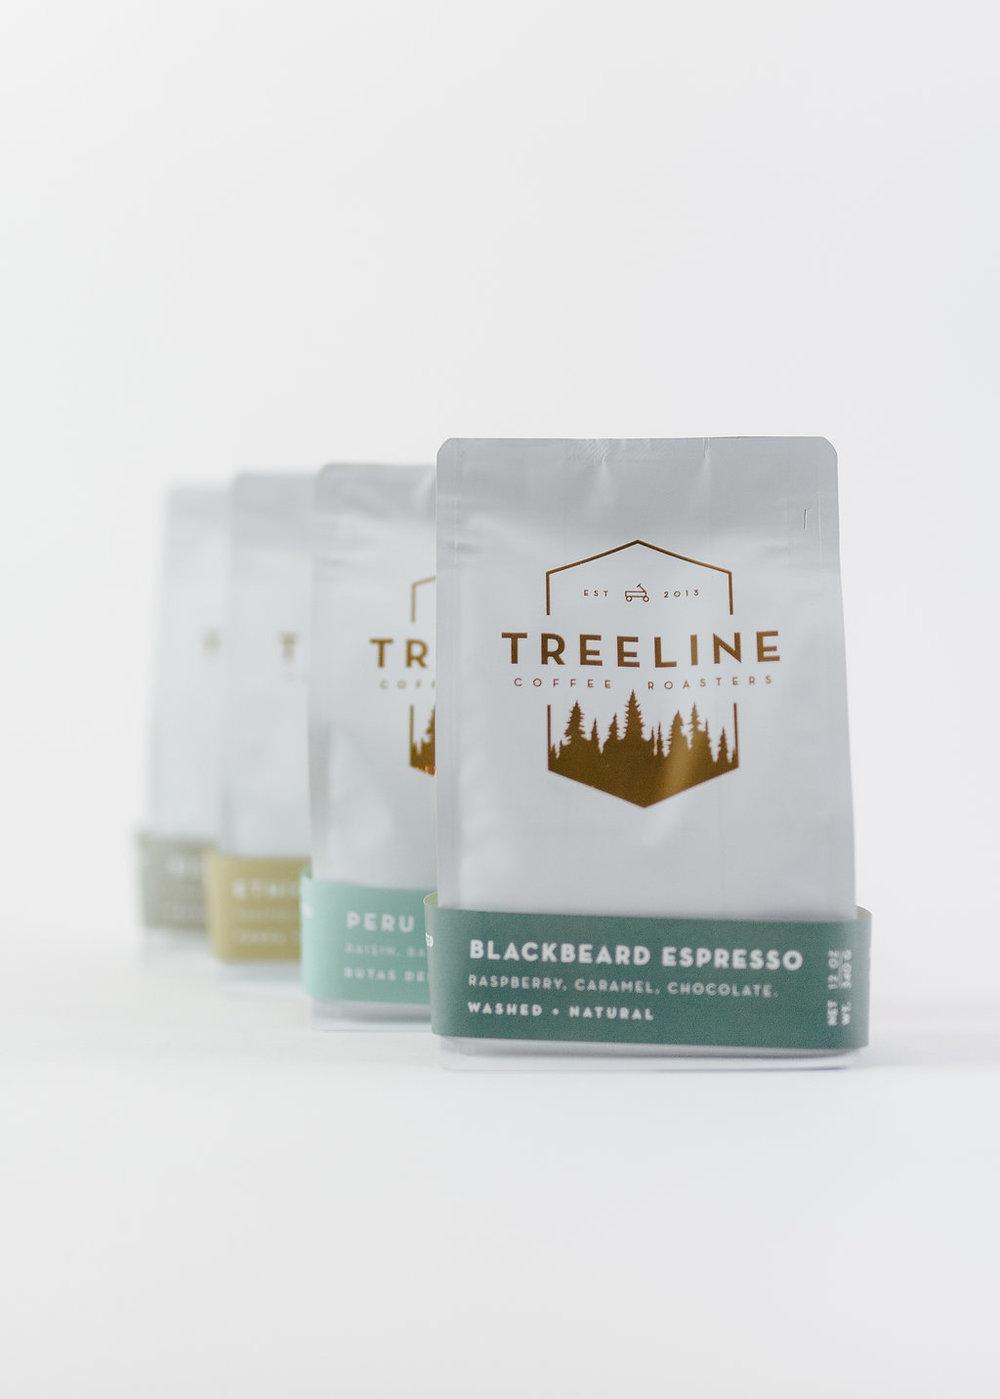 TOWNSENDCOLLECTIVE-Treeline-2.1.jpg